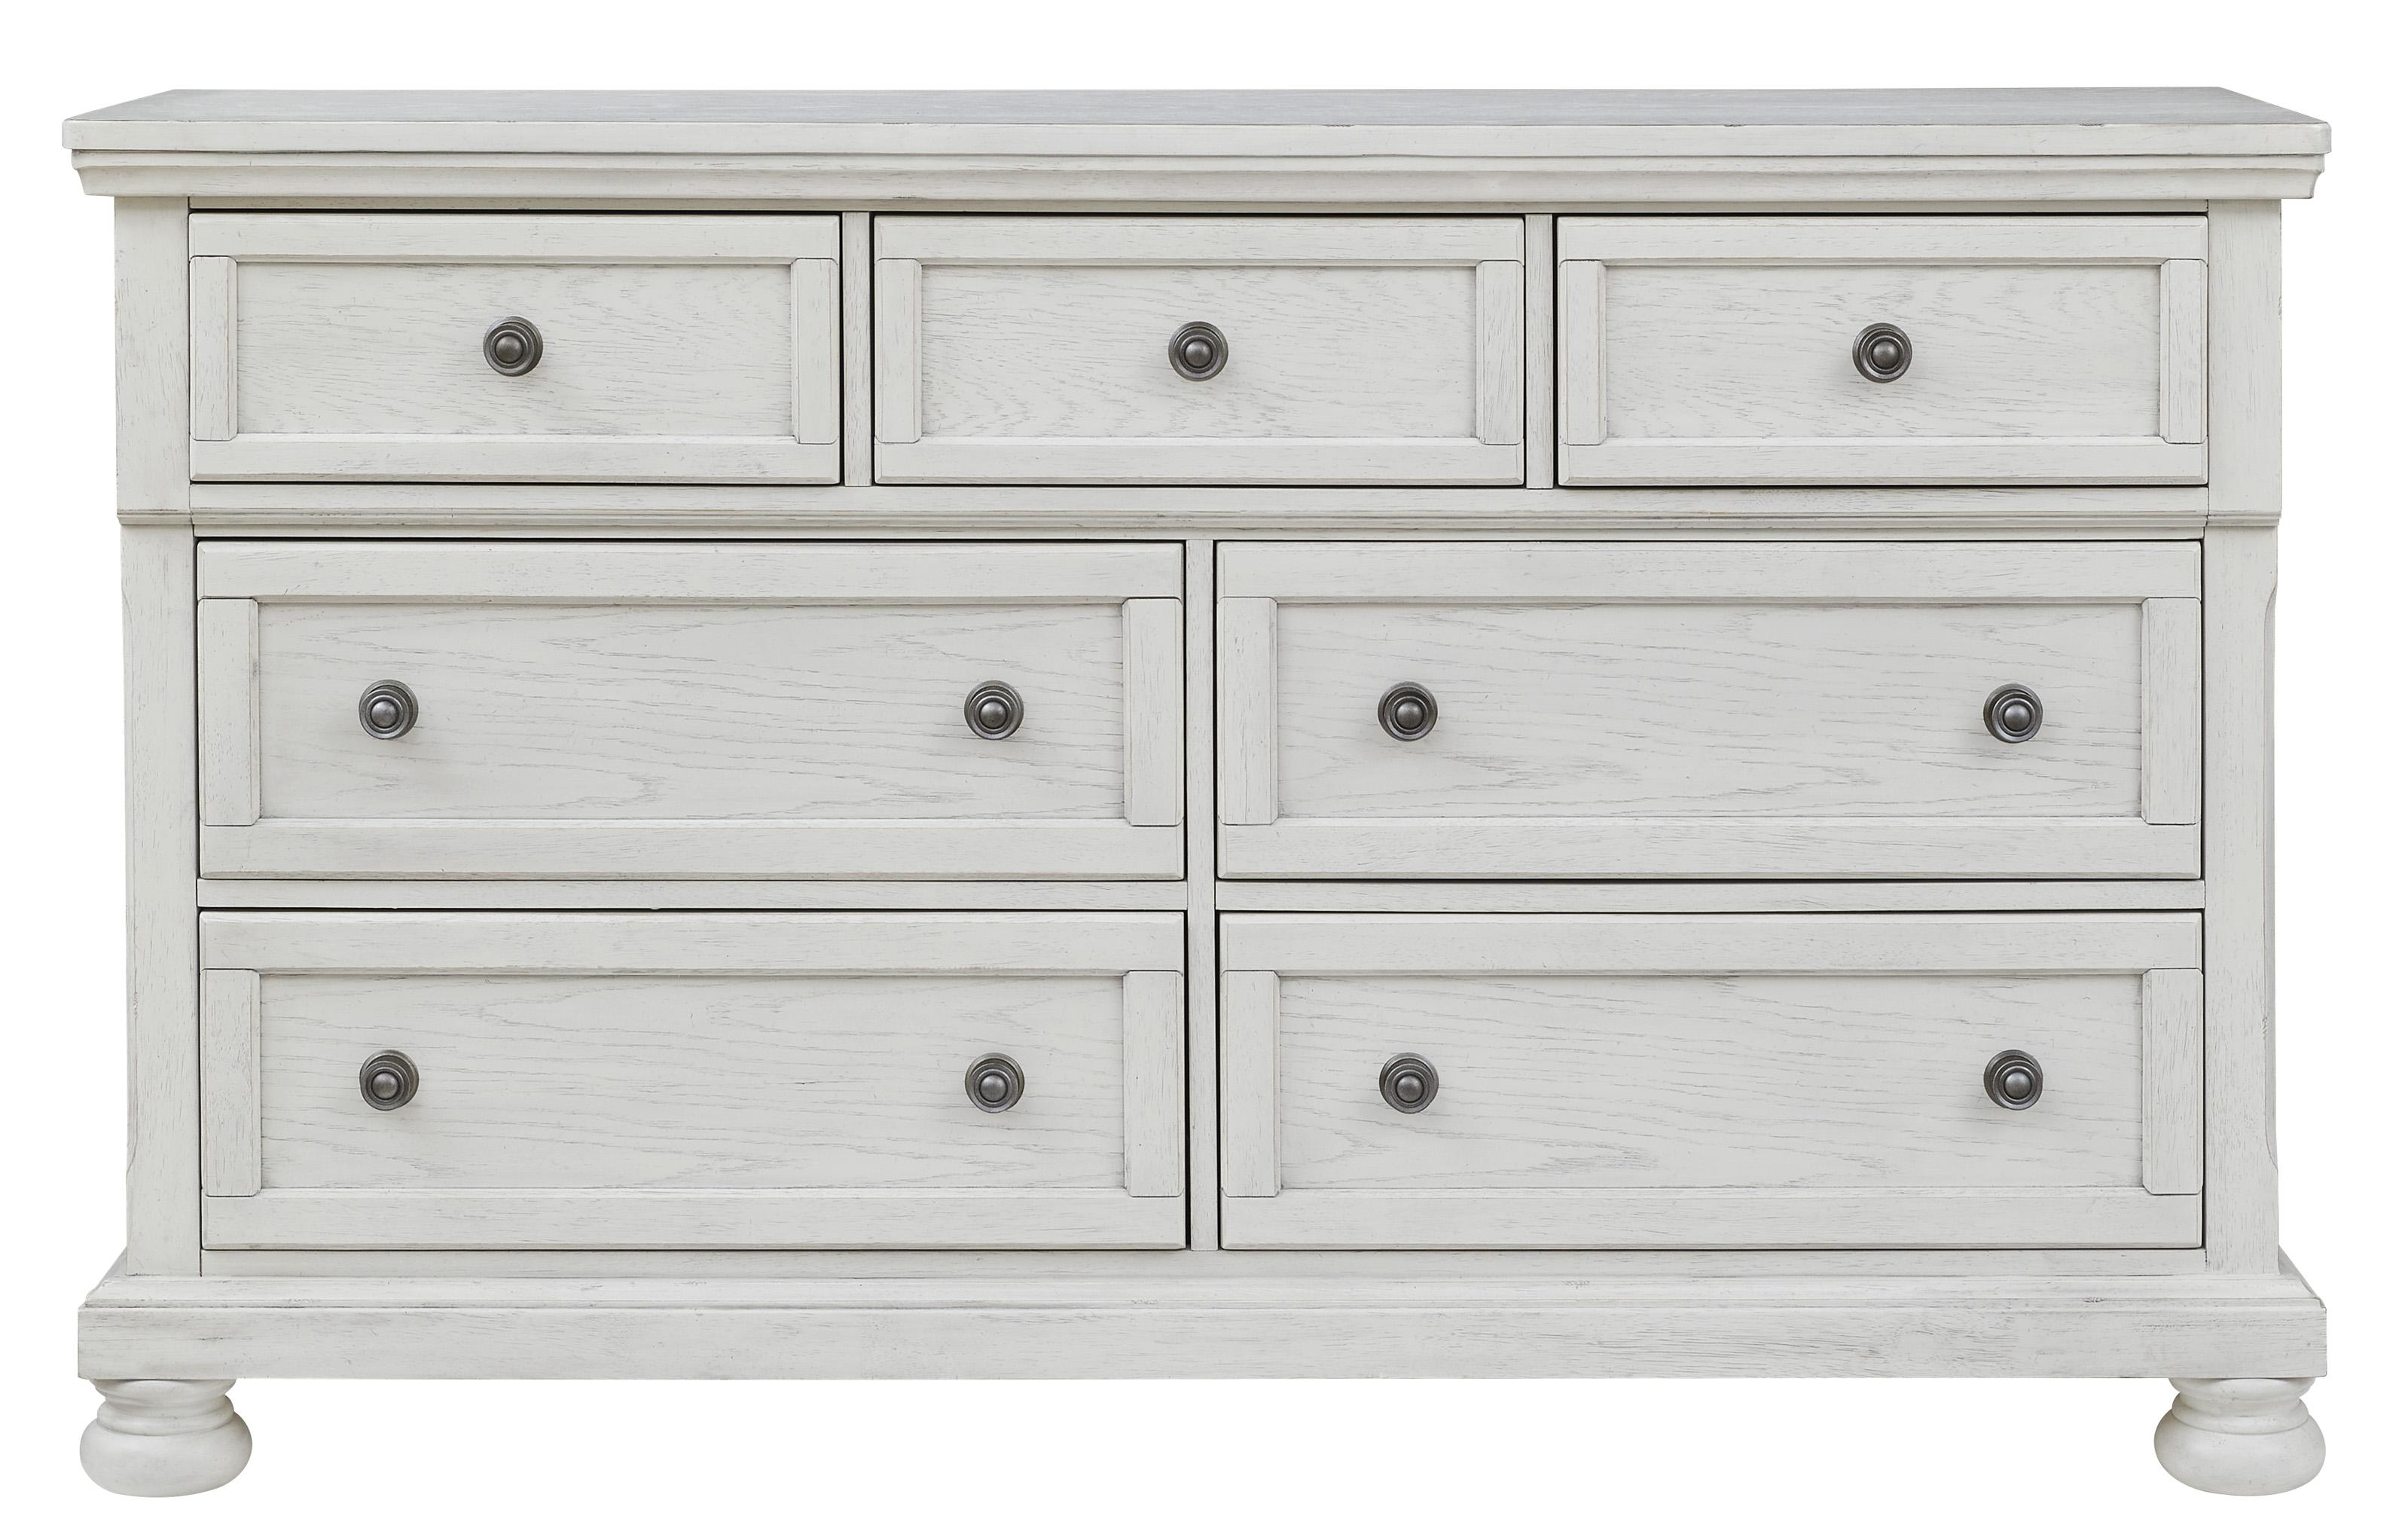 Robbinsdale Dresser by Signature Design by Ashley at Lynn's Furniture & Mattress